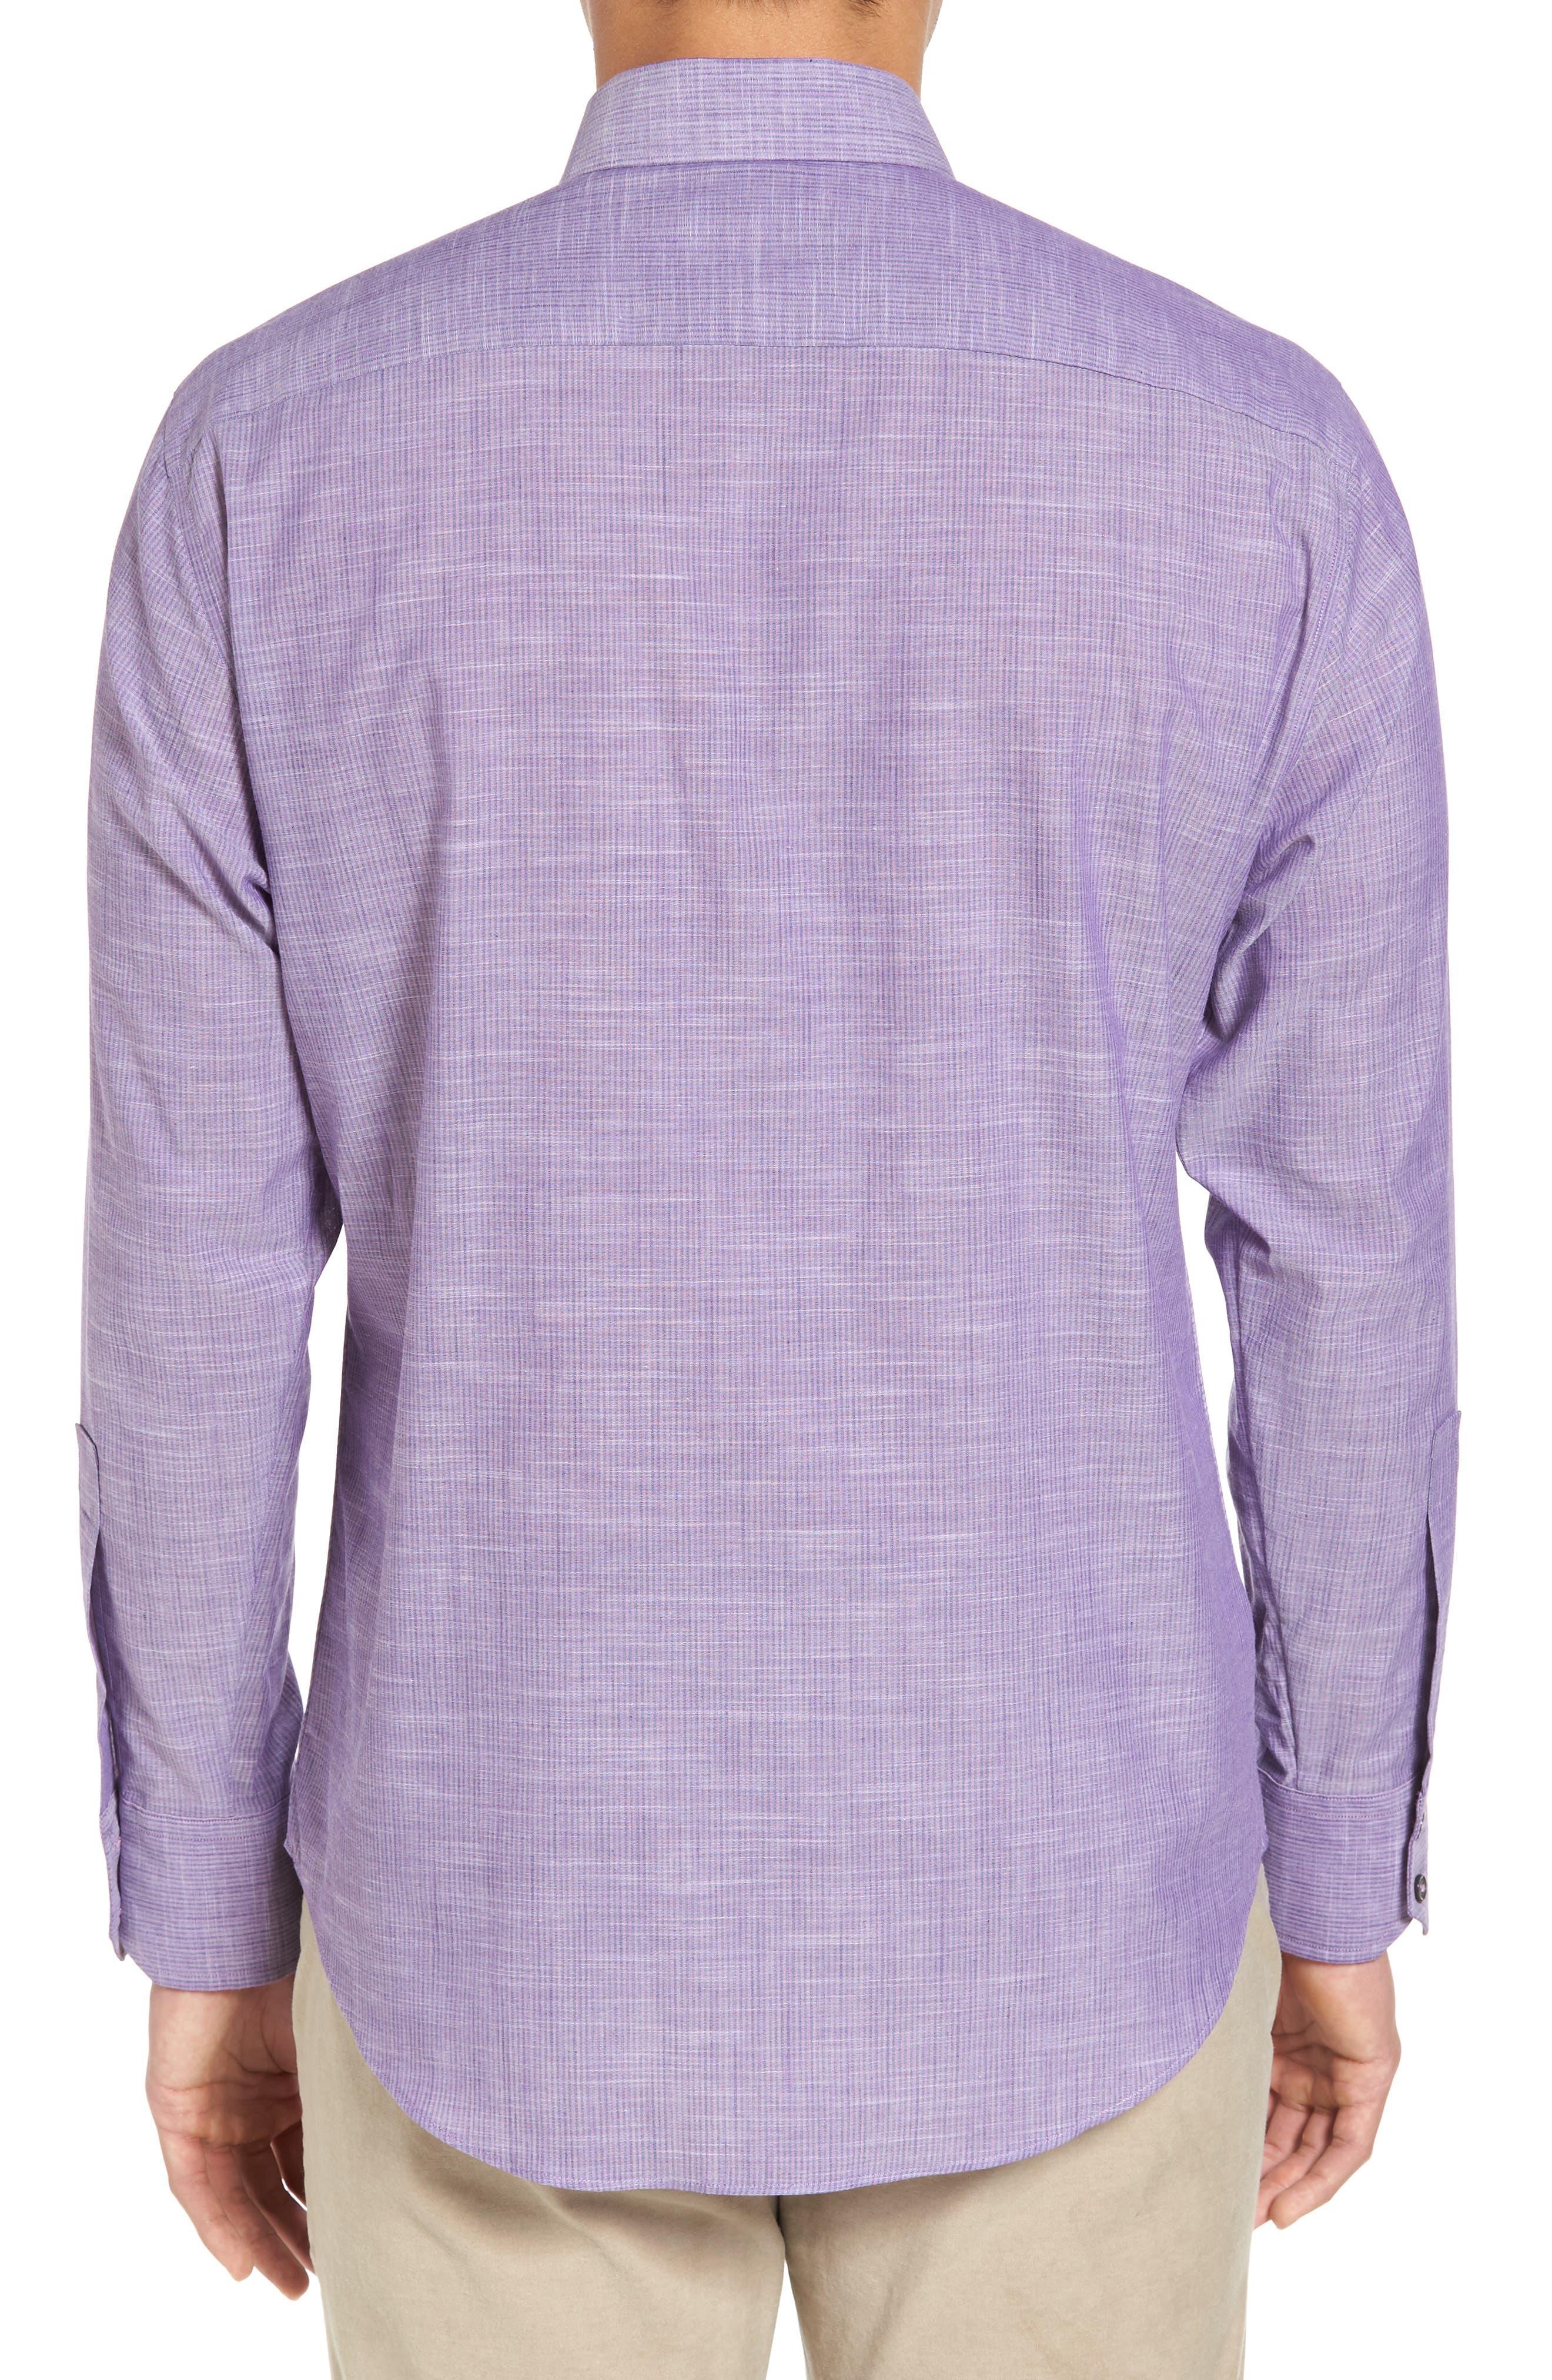 Snower Slim Fit Sport Shirt,                             Alternate thumbnail 2, color,                             500